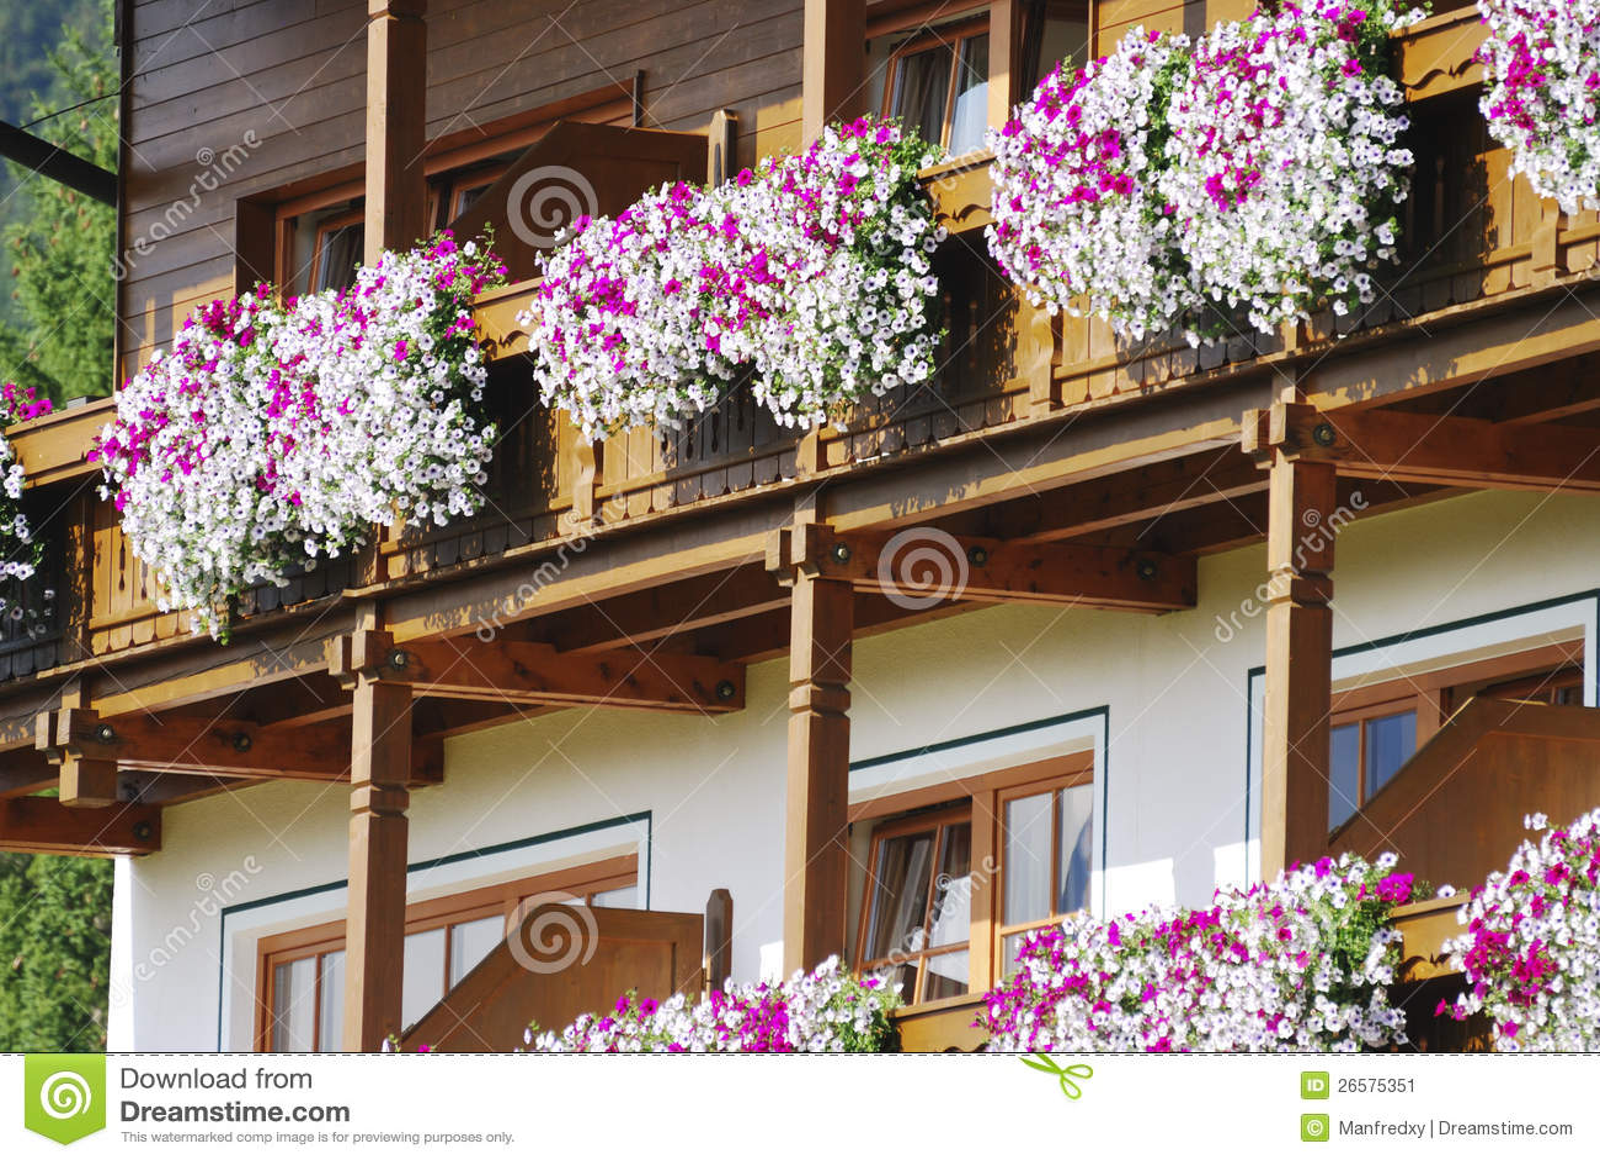 blumen balkon stockbild bild 26575351. Black Bedroom Furniture Sets. Home Design Ideas